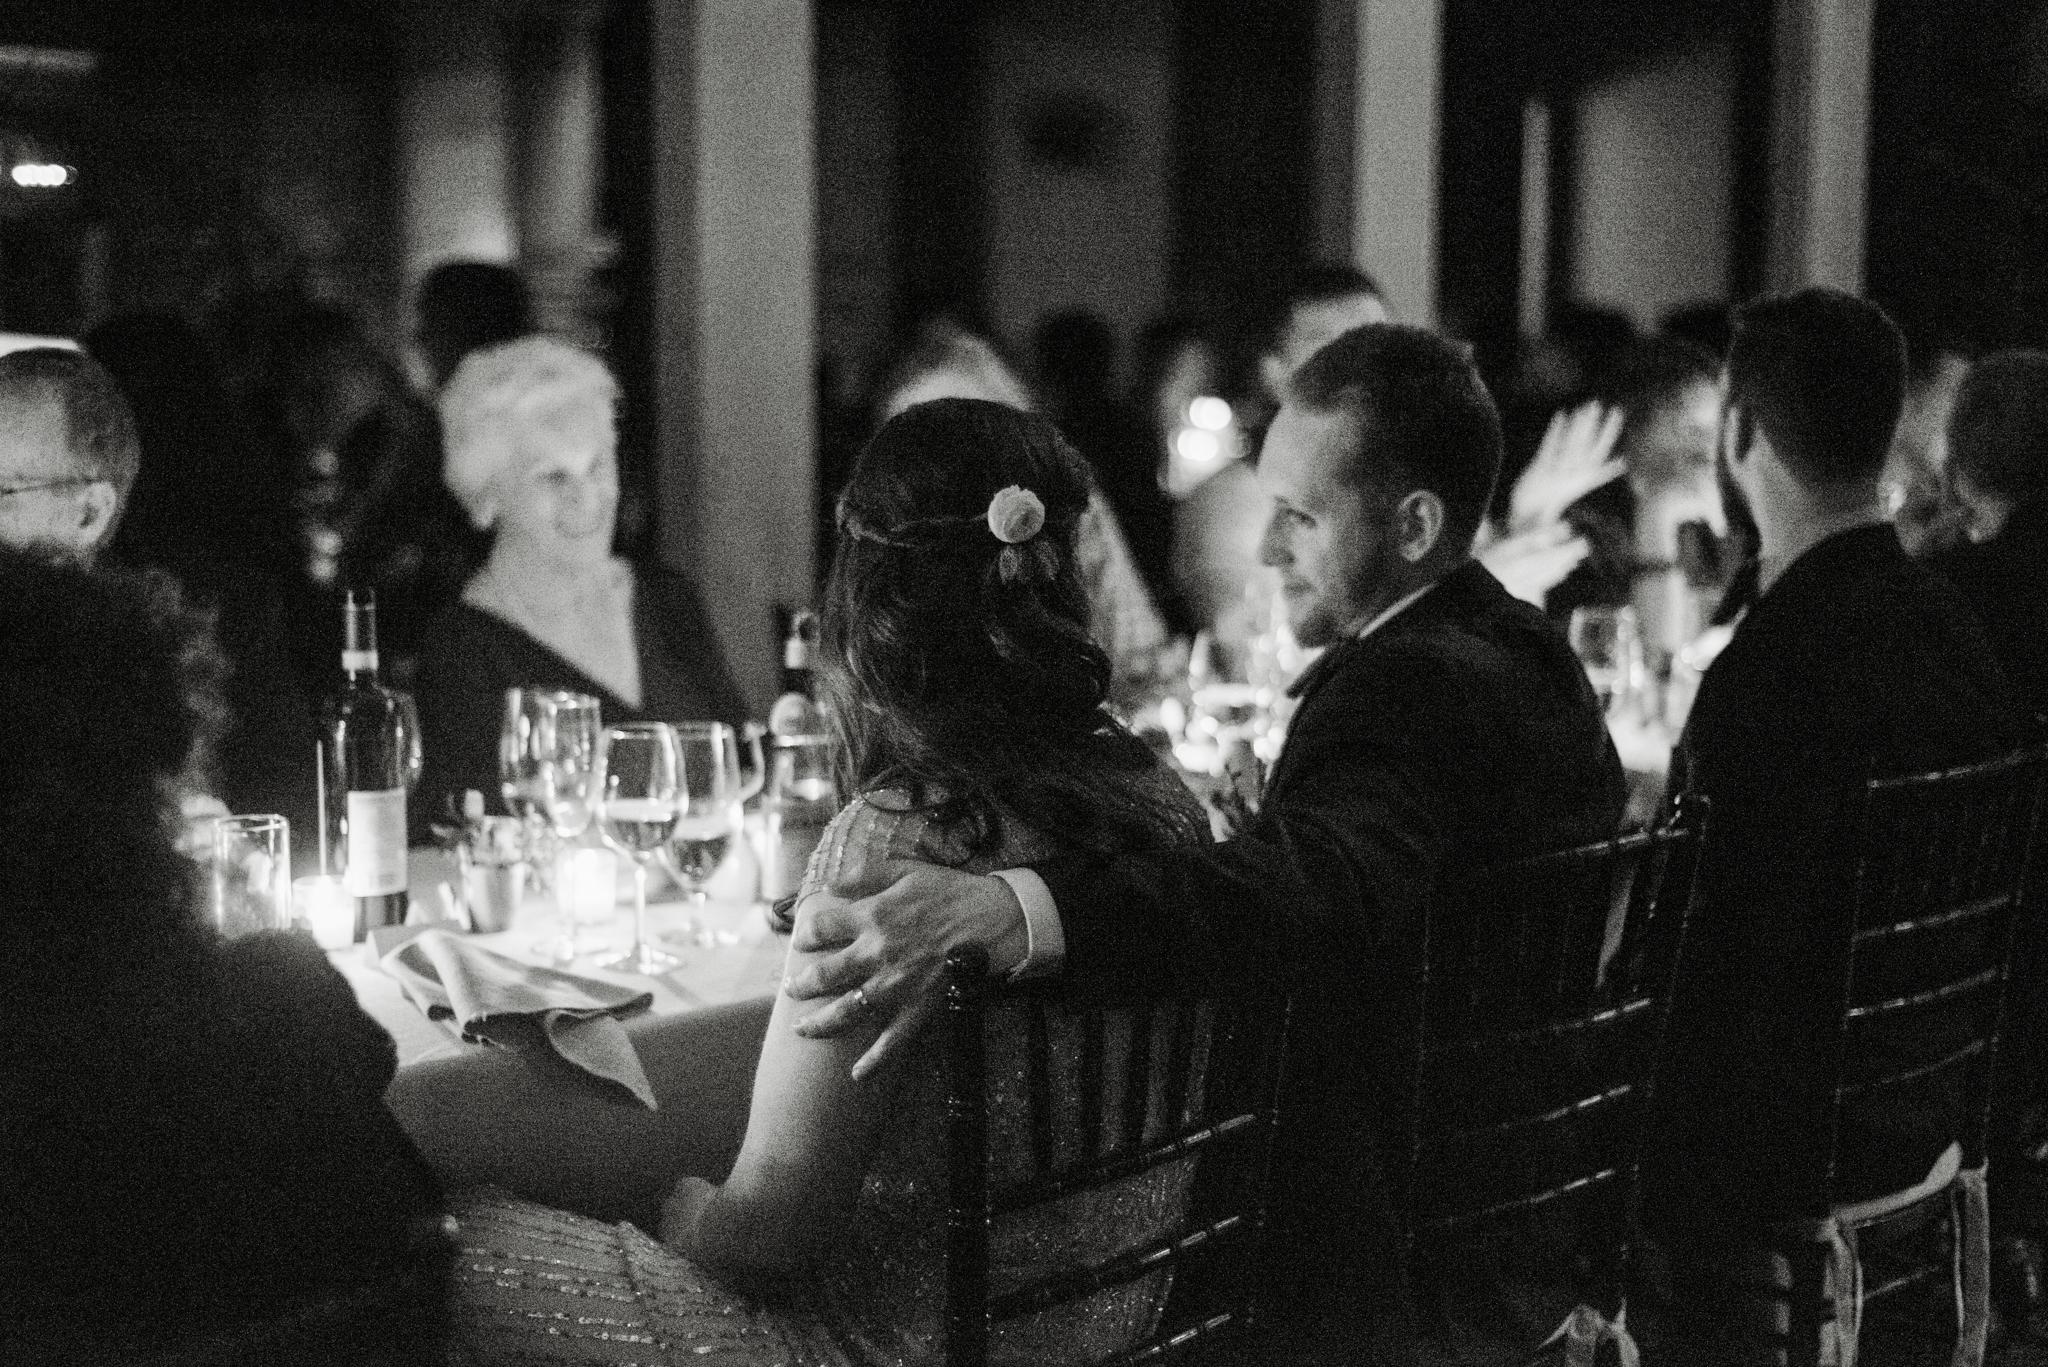 Intimate Dinner Wedding - Small Wedding with Candlelit Dinner - Sperryville Virginia Wedding - Backyard Wedding - Flourish Root Wedding Flowers - White Sails Creative Wedding - Cozy Wedding - Casual Wedding - Intimate Wedding_58.jpg